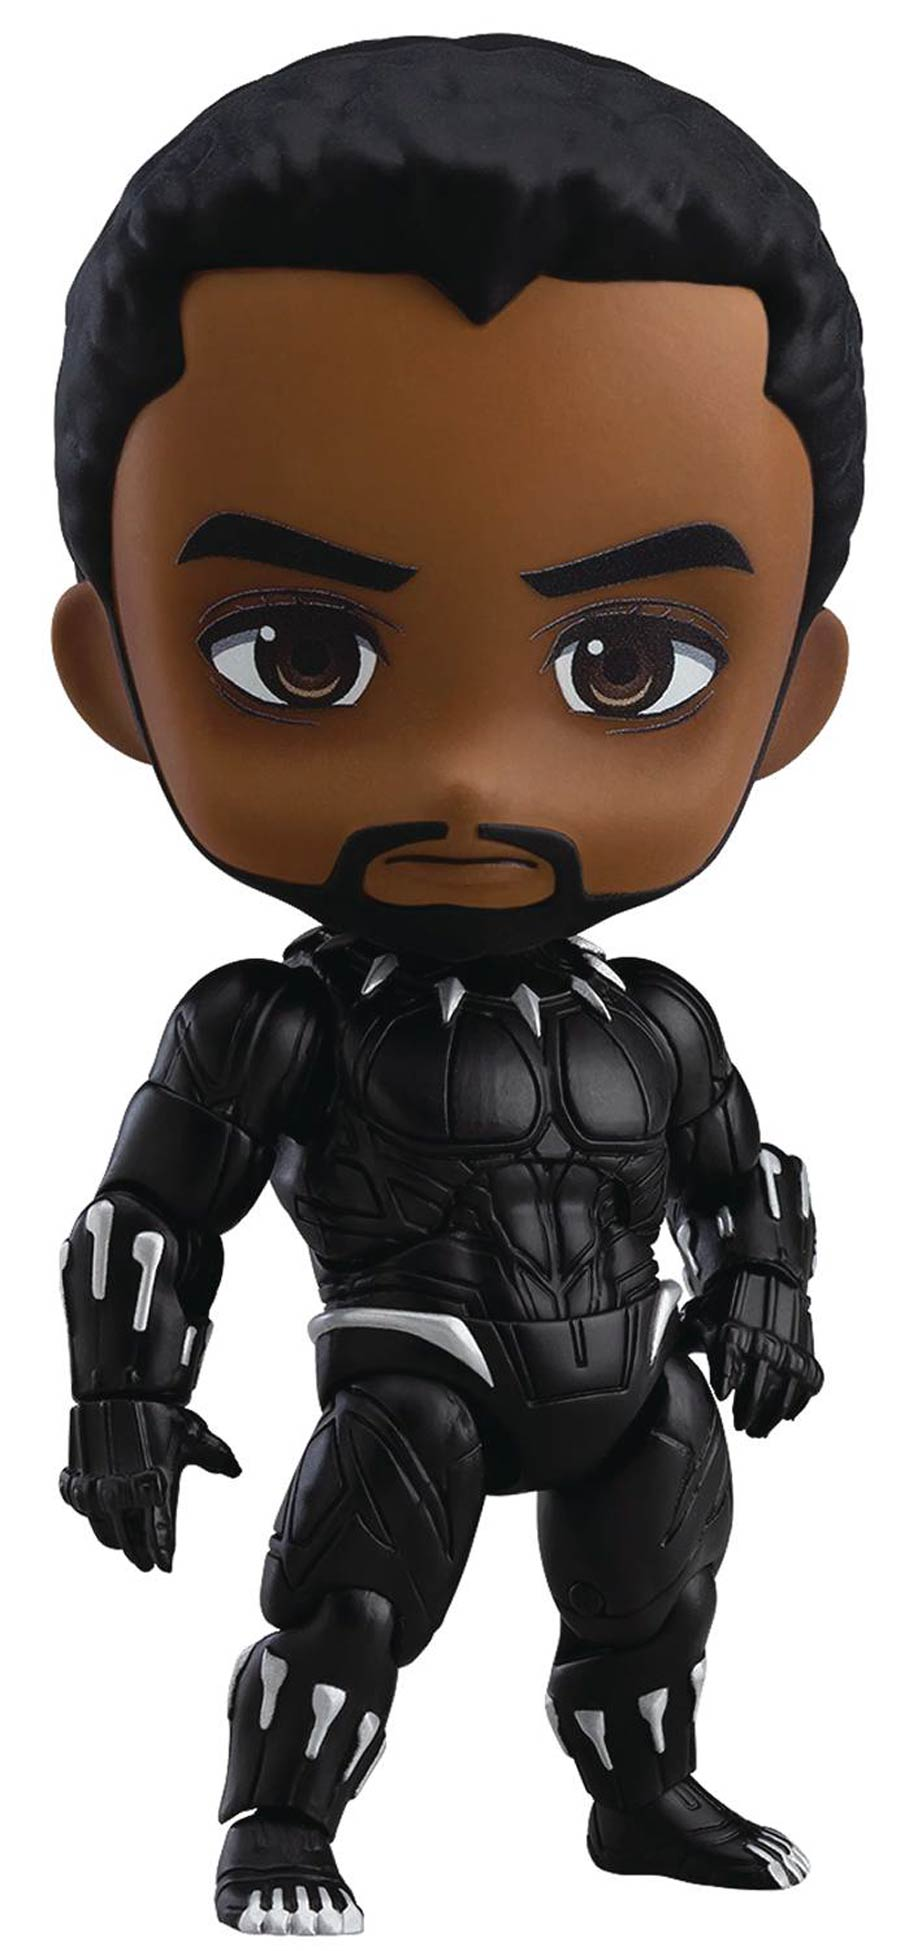 Avengers Infinity War Black Panther Nendoroid DX